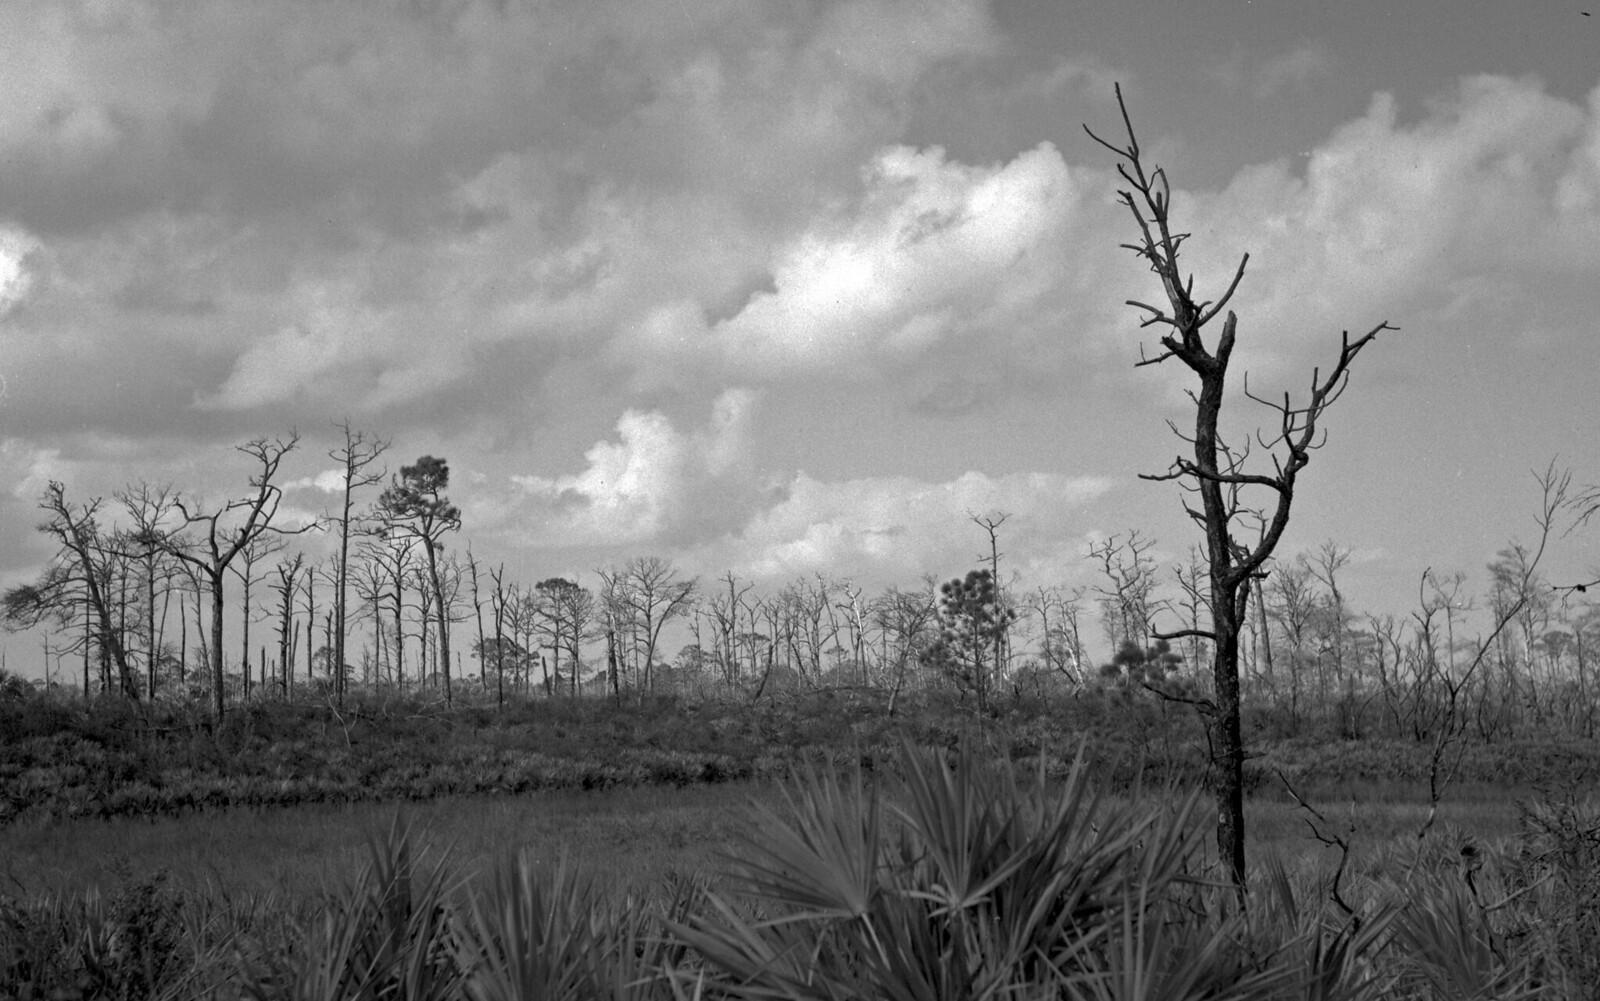 Apocalyptic Landscape | by PositiveAboutNegatives